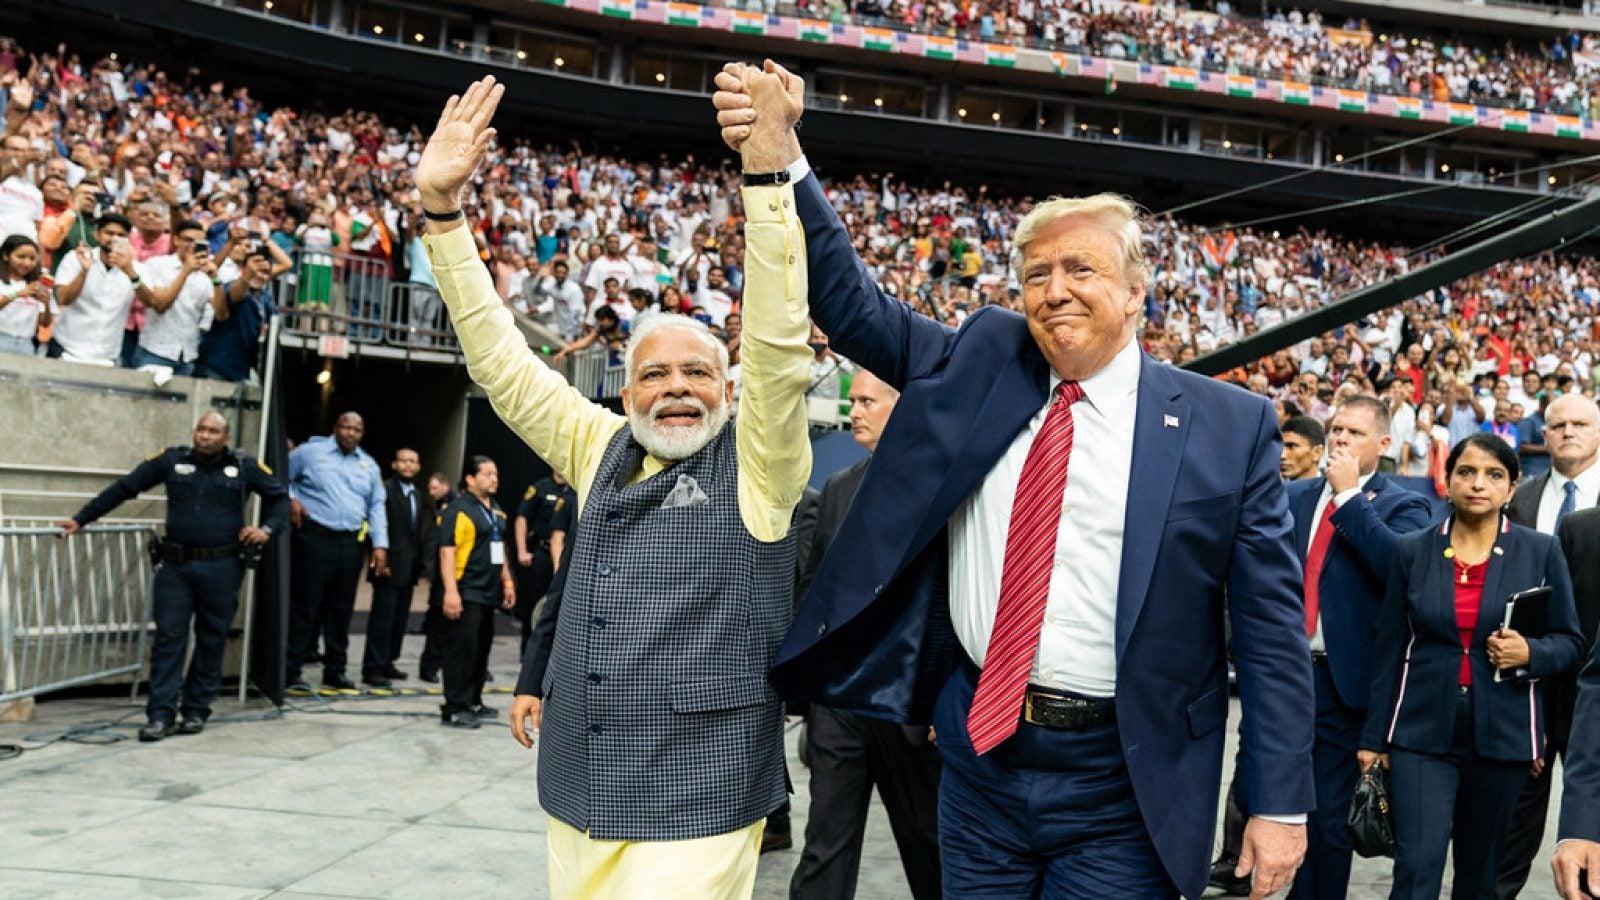 Donald Trump and Narendra Modi at Rally in India